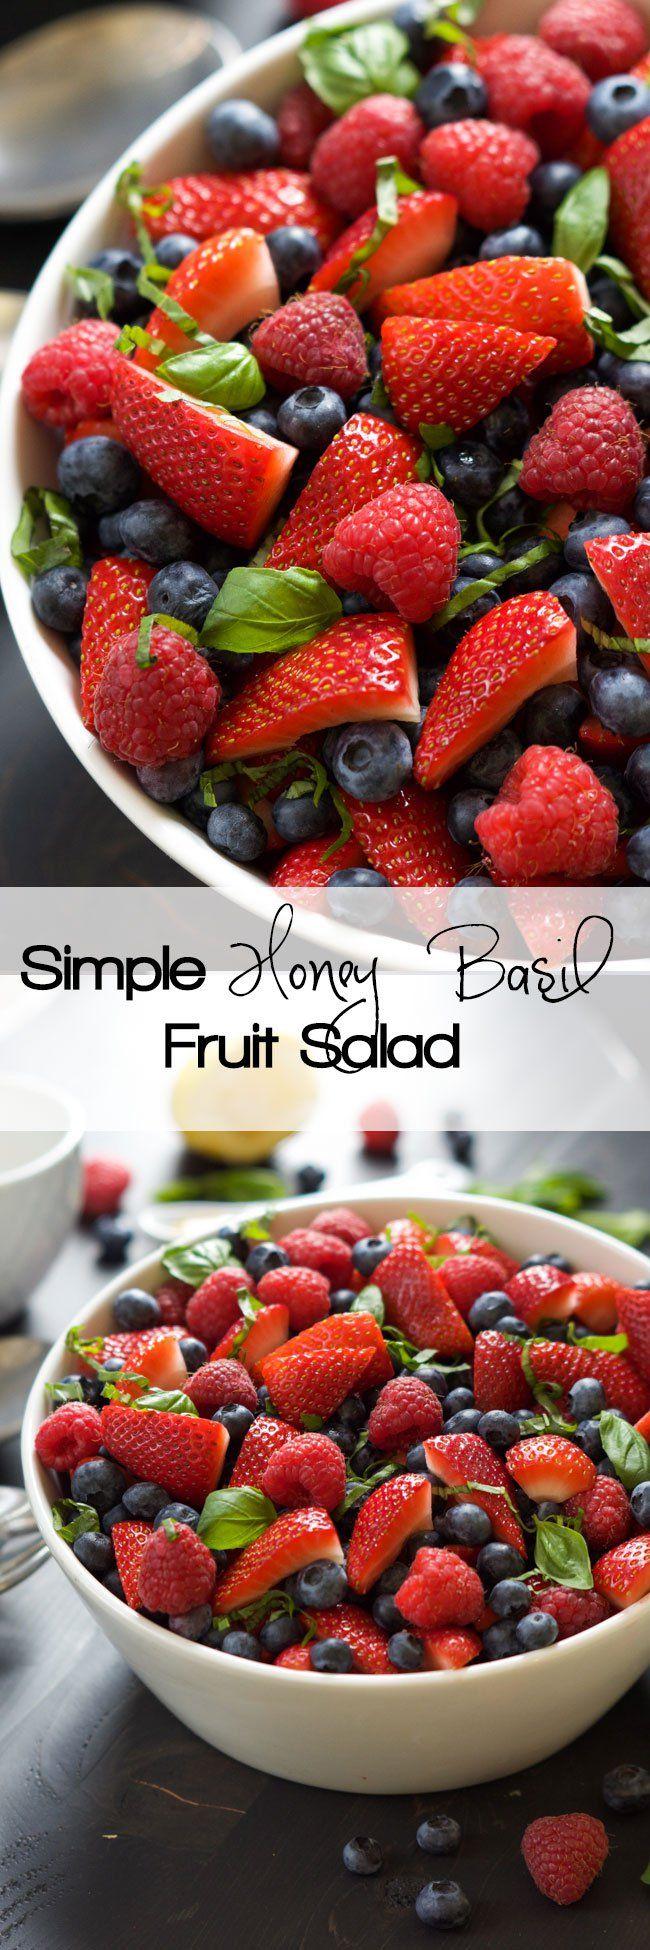 Fruitsalade met honing-citrus-basilicum dressing